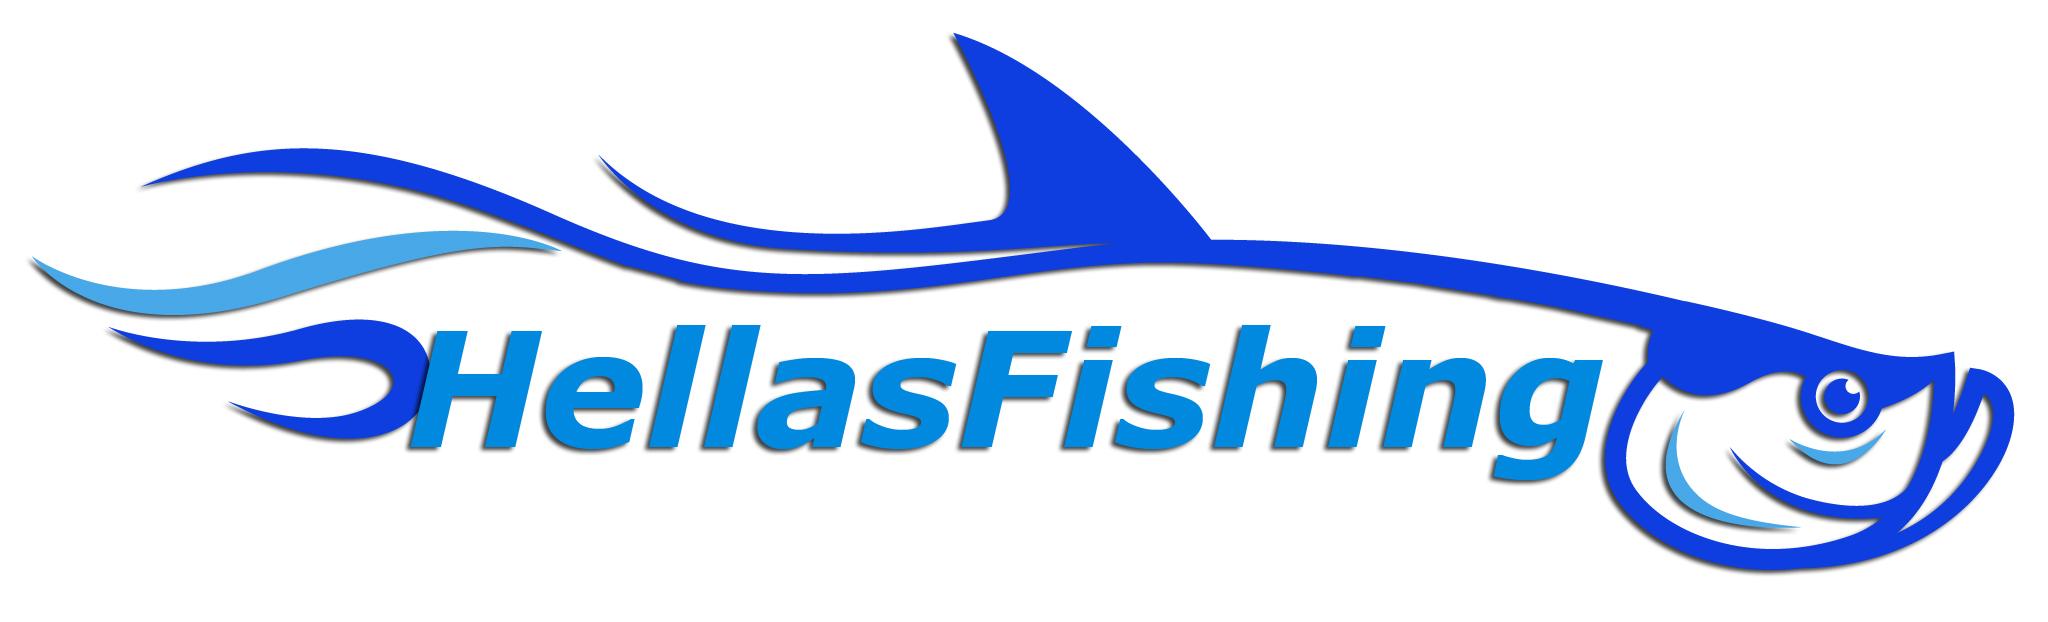 Hellasfishing Τα Πάντα για το Ψάρεμα